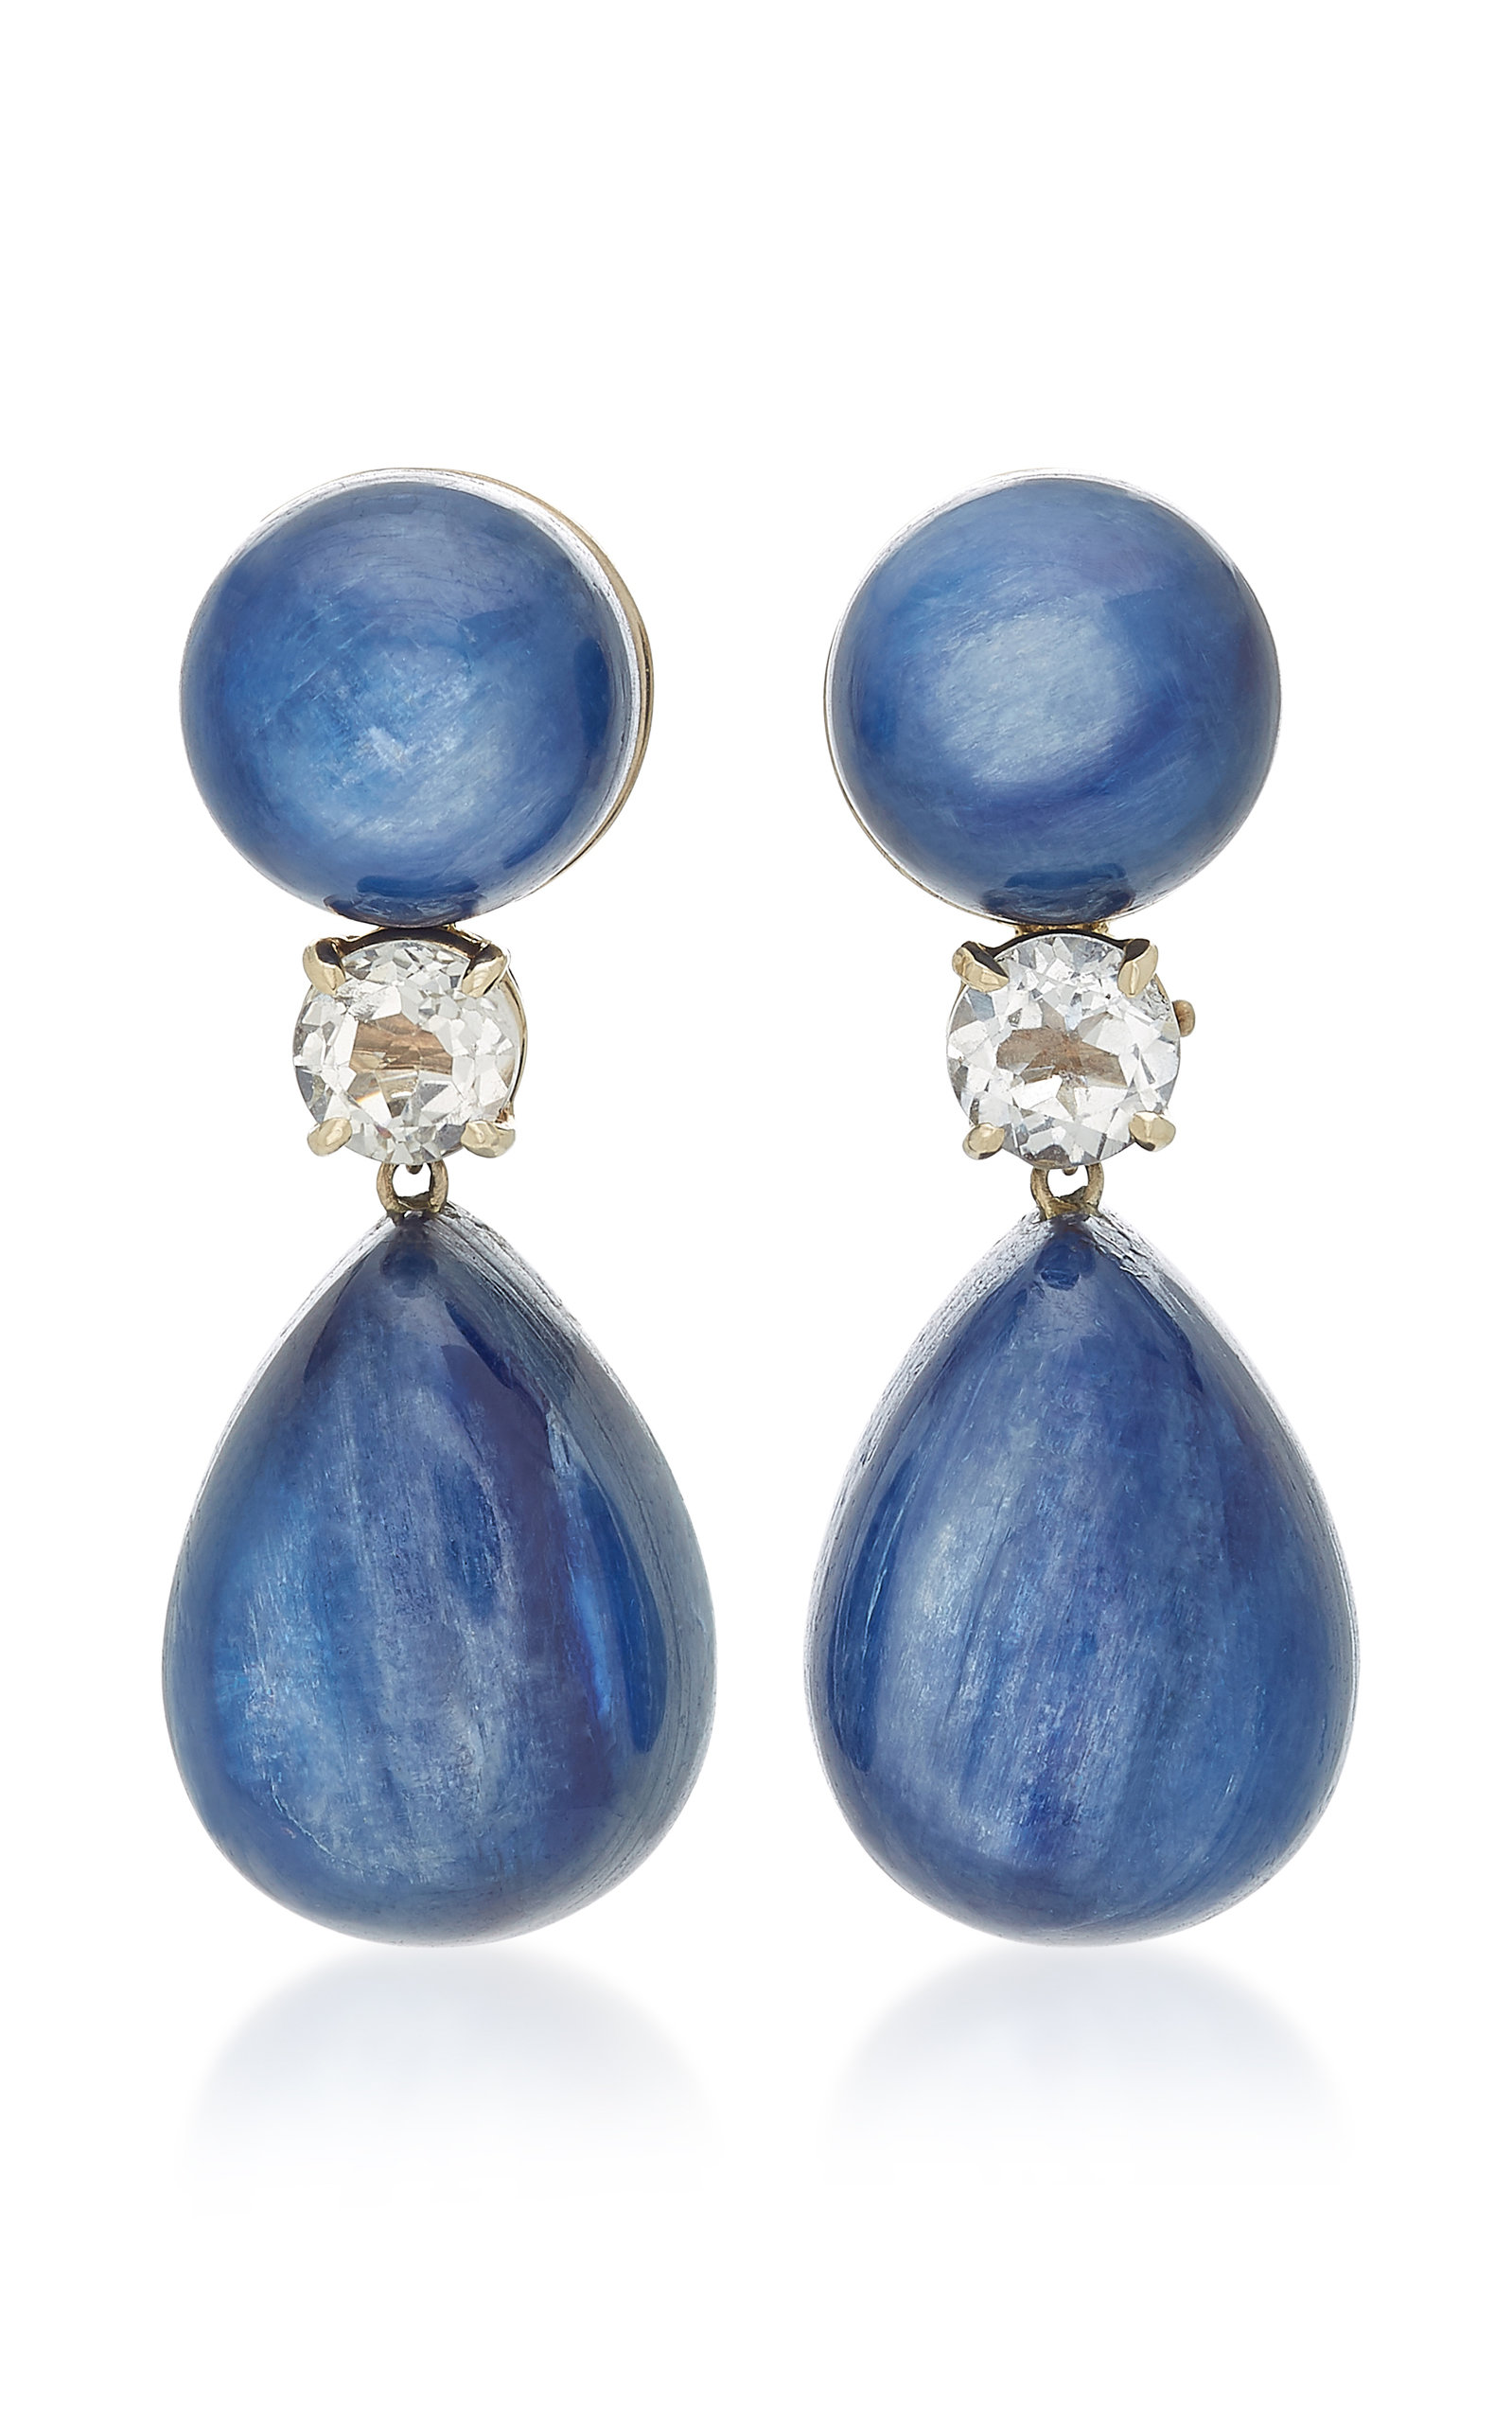 SORAB & ROSHI 18K White Gold Kynite And Topaz Earrings in Blue